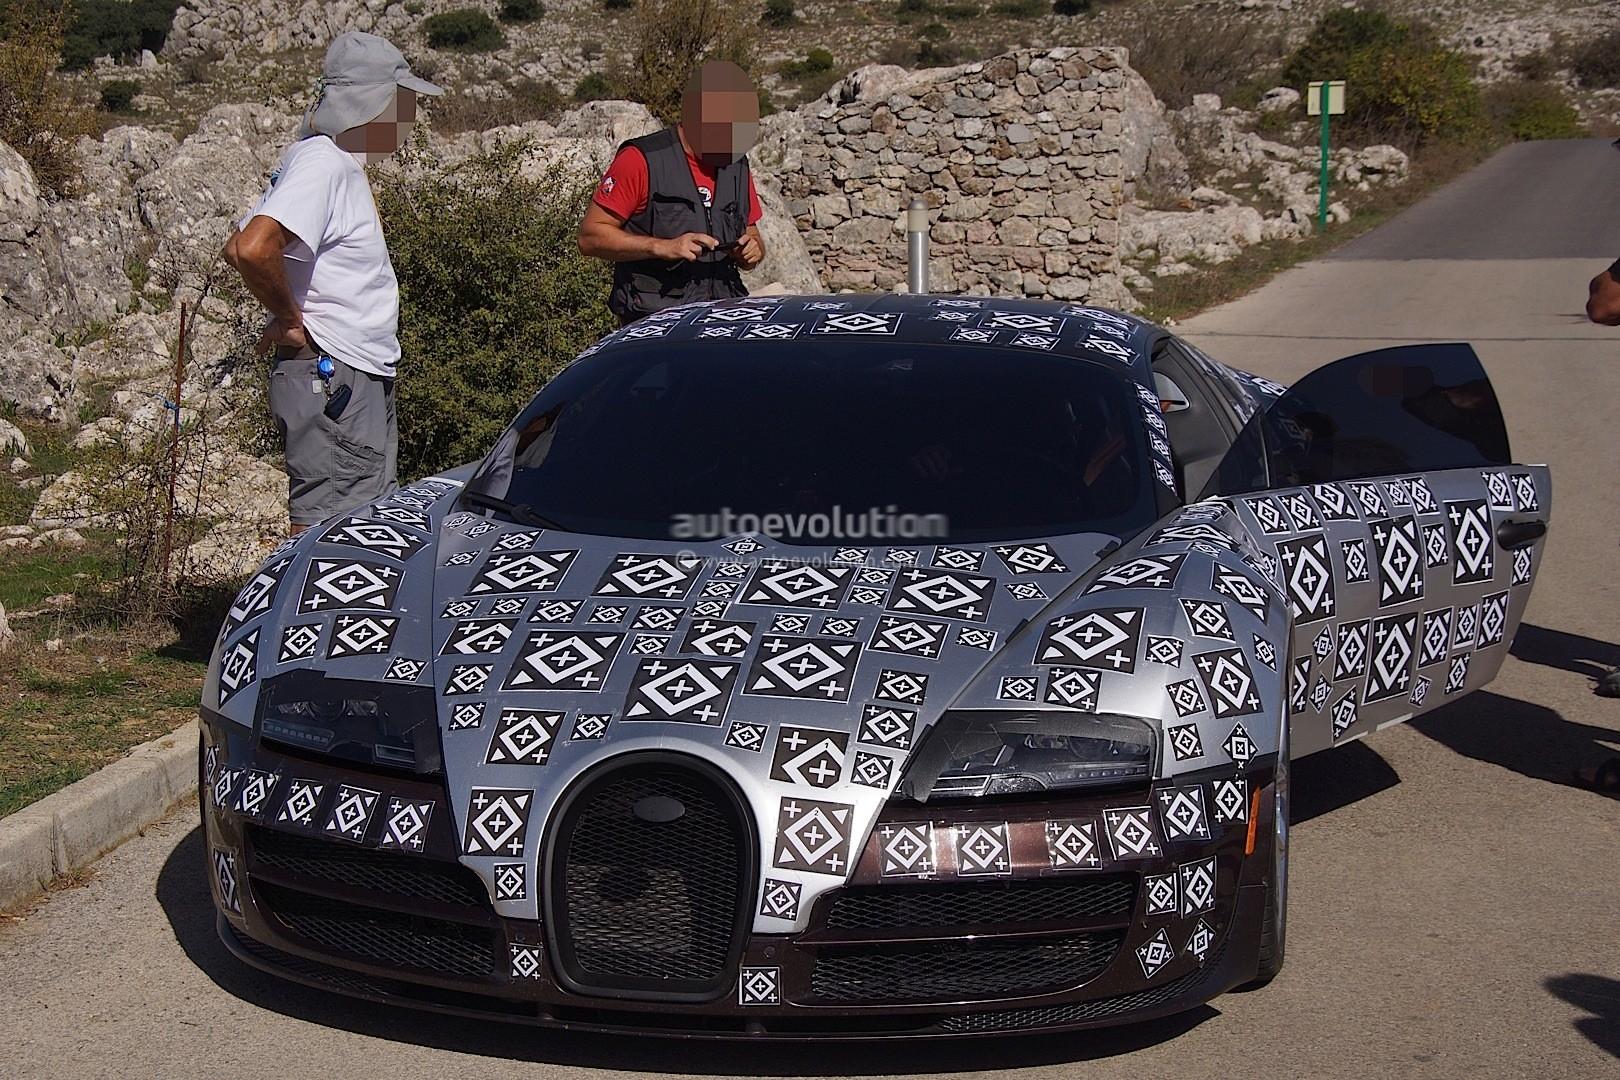 New Bugatti Chiron Teaser Released Prepare For The Fastest Hybrid Car In World Video